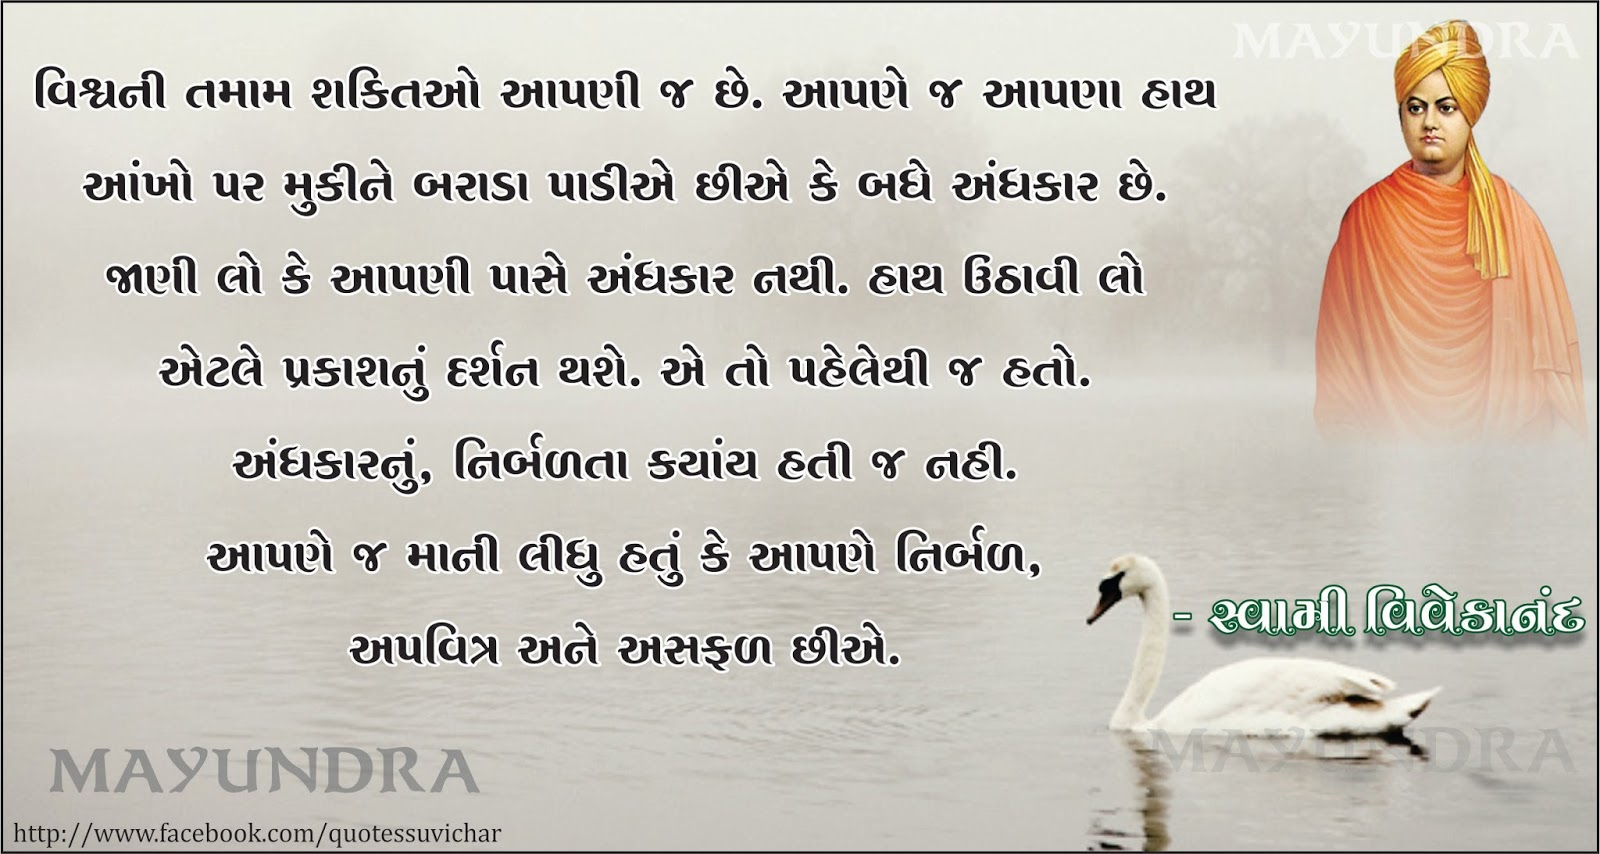 Quotes Vivekananda Gujarati Quotes  Swami Vivekananda  Quotes India  Quotes